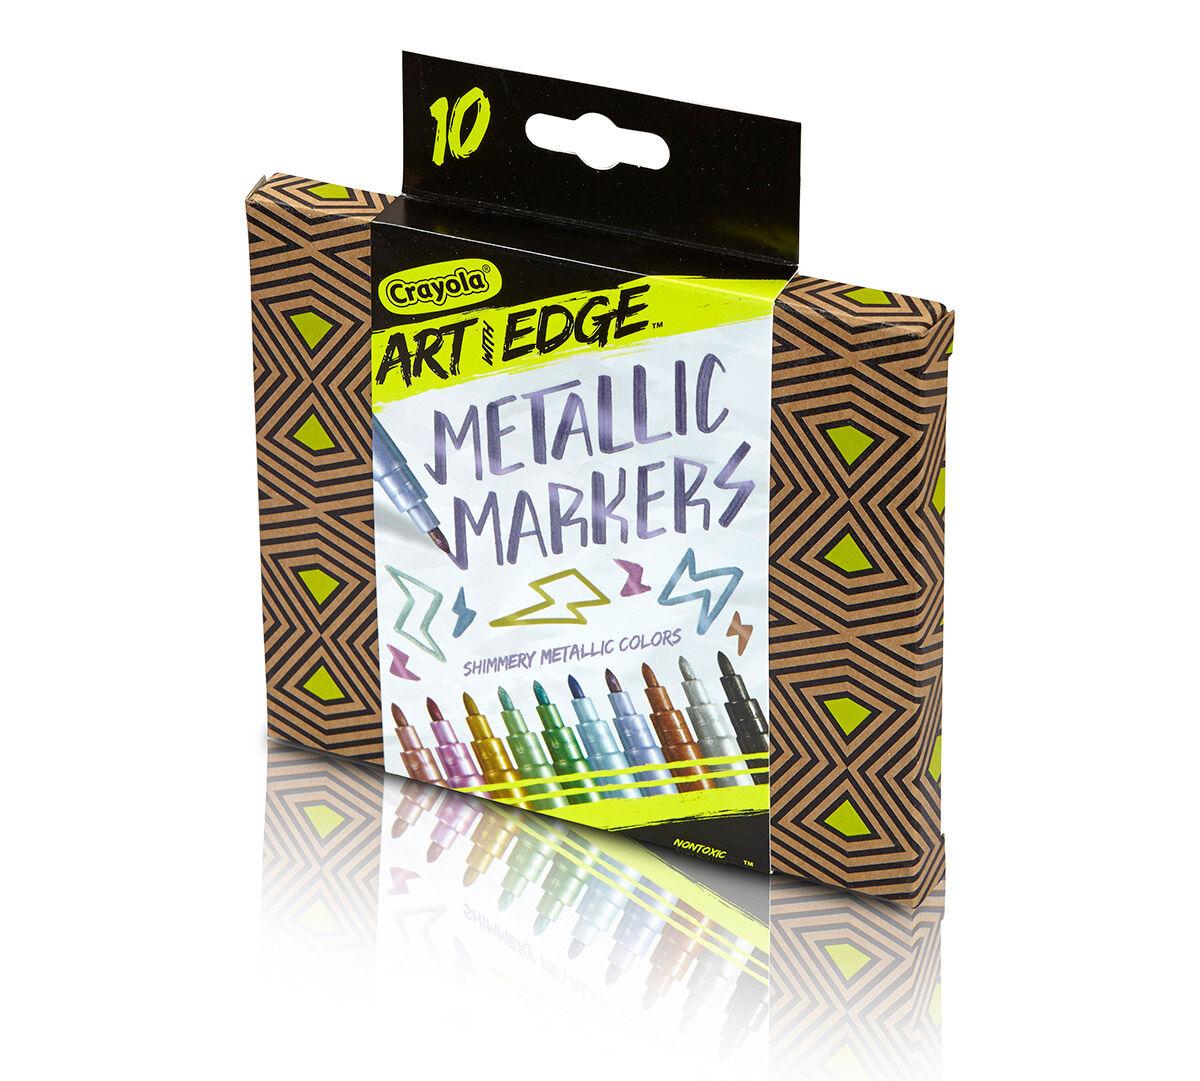 Crayola Art With Edge Metallic Markers Art Tools 10